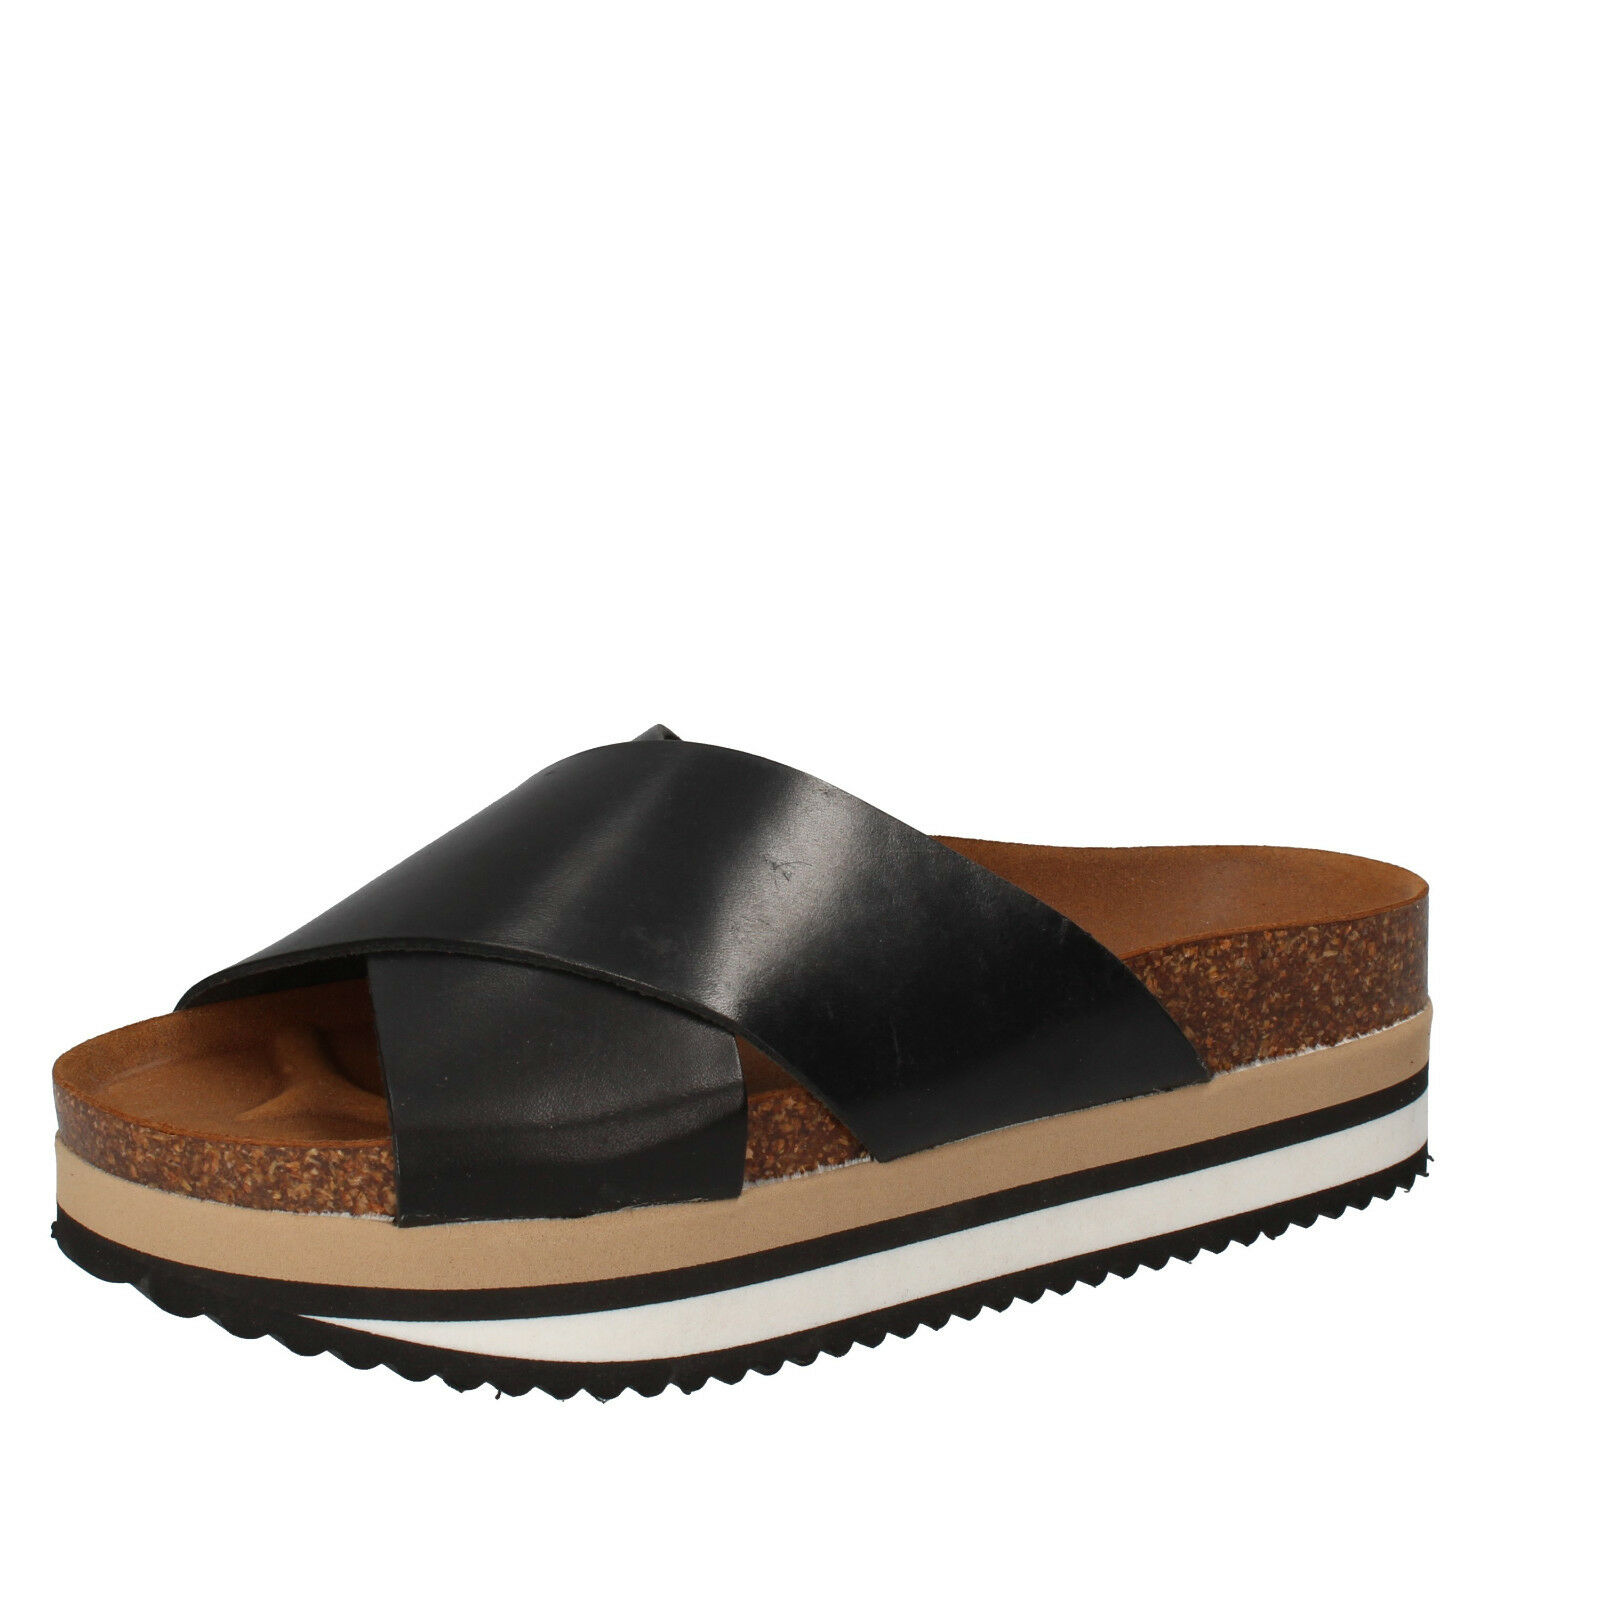 Scarpe donna sandali 5 PRO JECT 40 EU sandali donna nero pelle AC696-F 7268bb